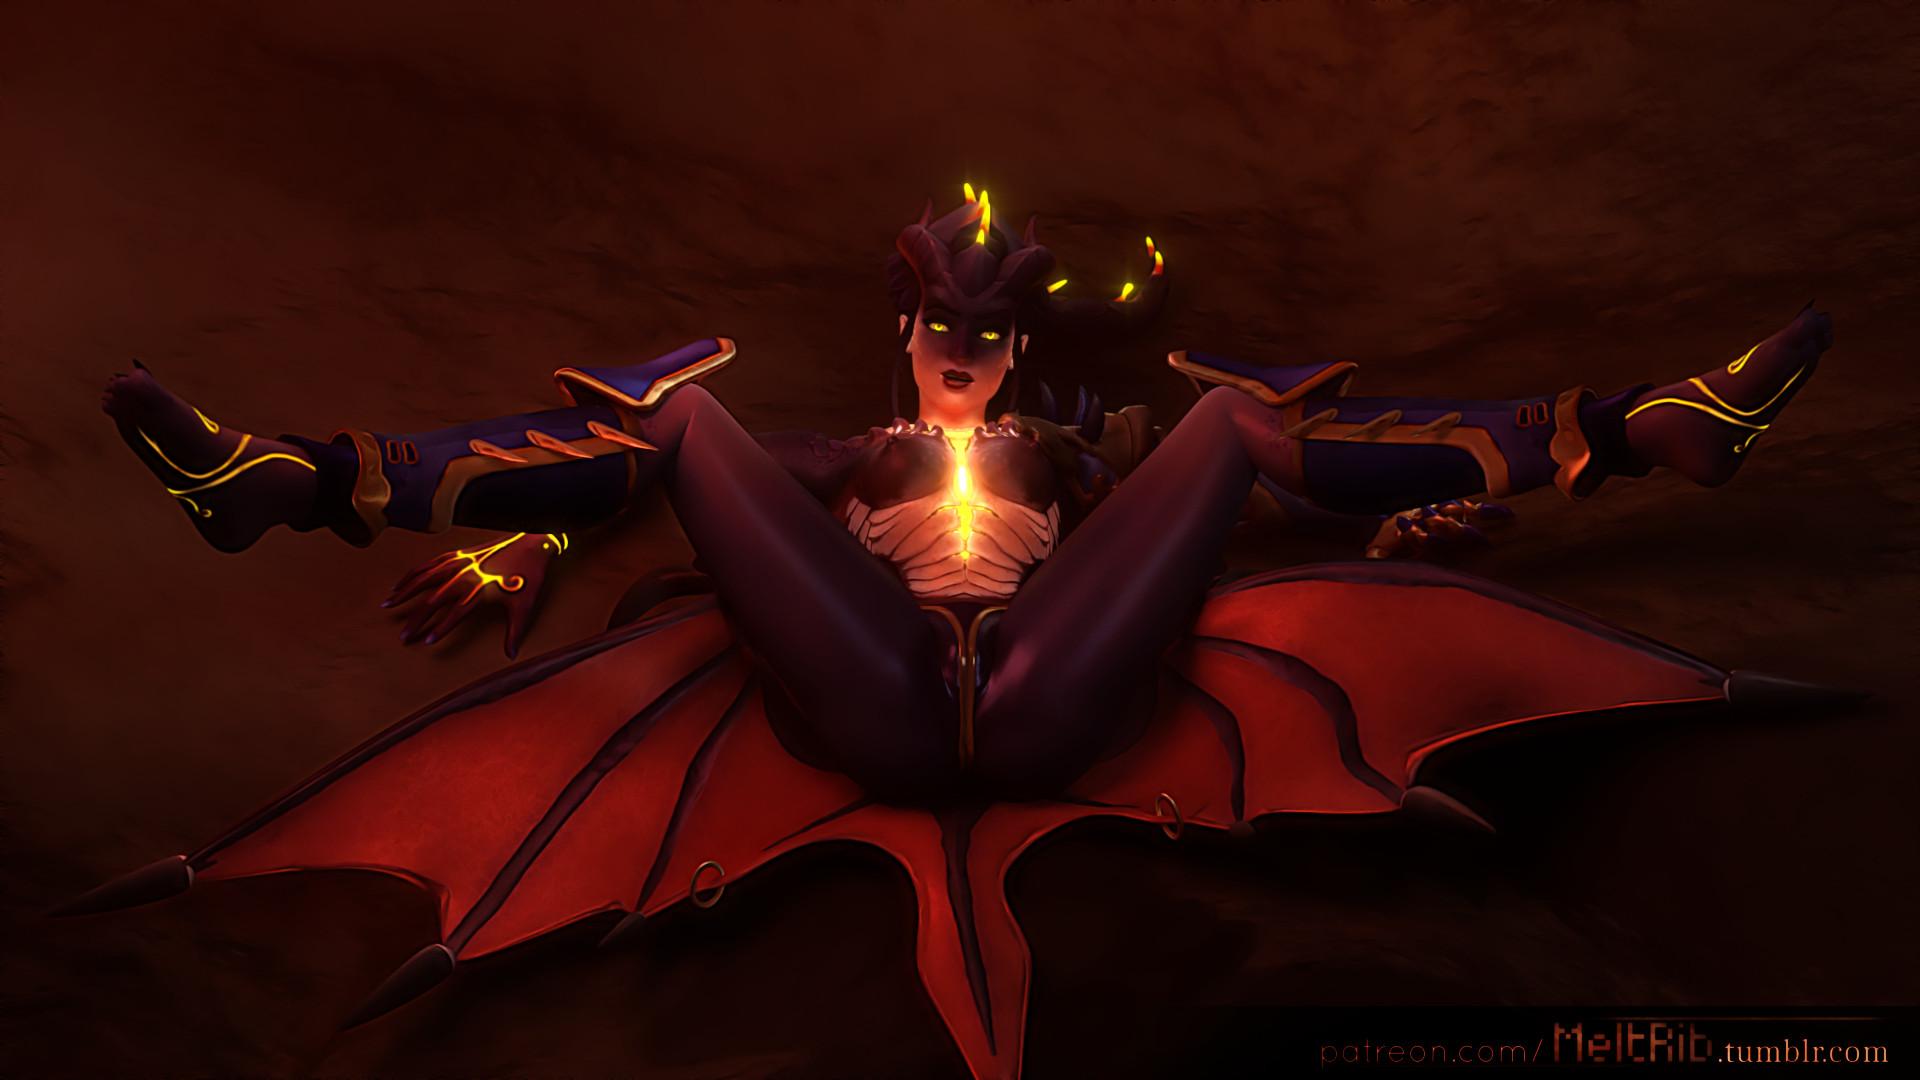 2369808 - Halloween MeltRib Overlook Symmetra blender